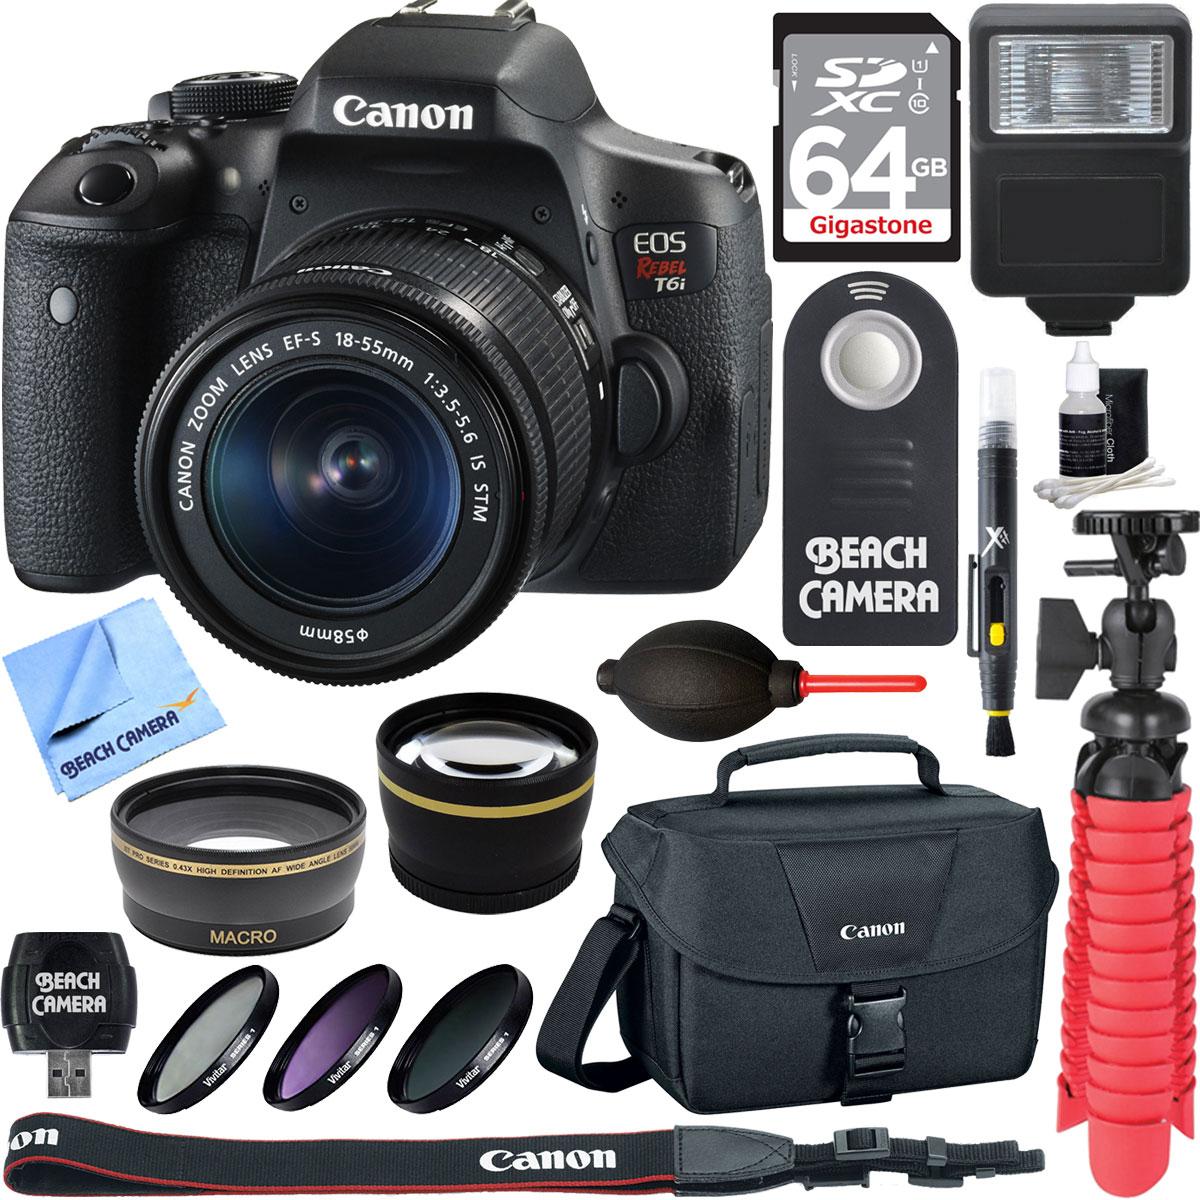 Canon EOS Rebel T6i Digital SLR Camera Wifi + EF-S 18-55mm